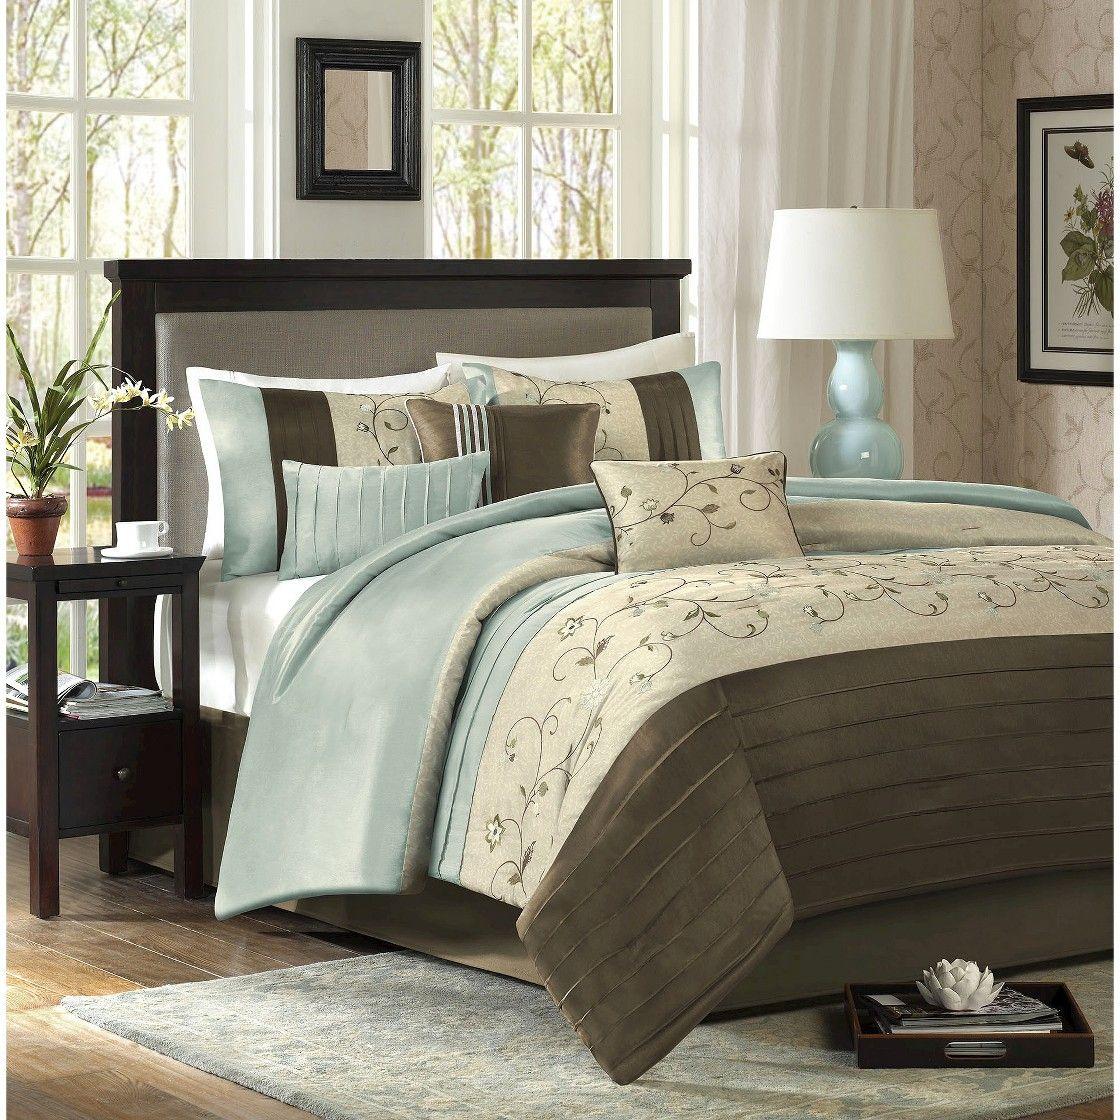 Monroe Embroidered Comforter Set